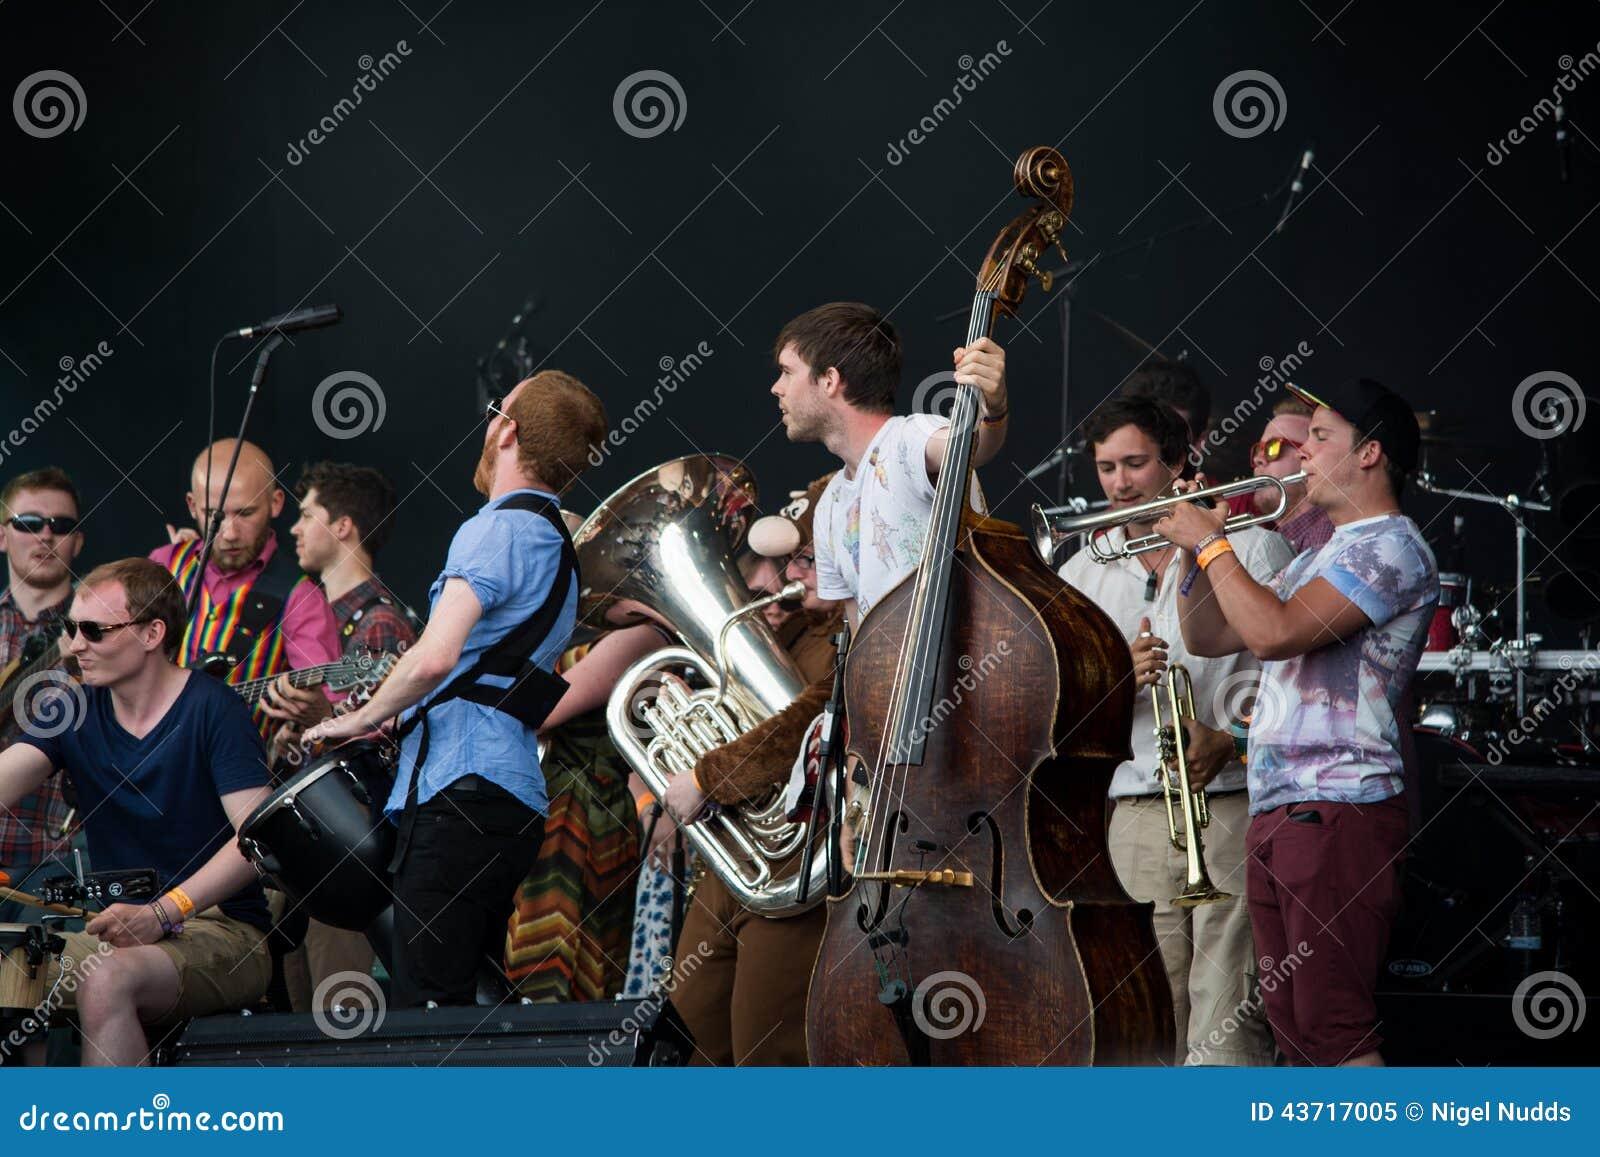 Fairport Cropredy Covention 2014 - Joe Broughton konserwatorium ludu zespół